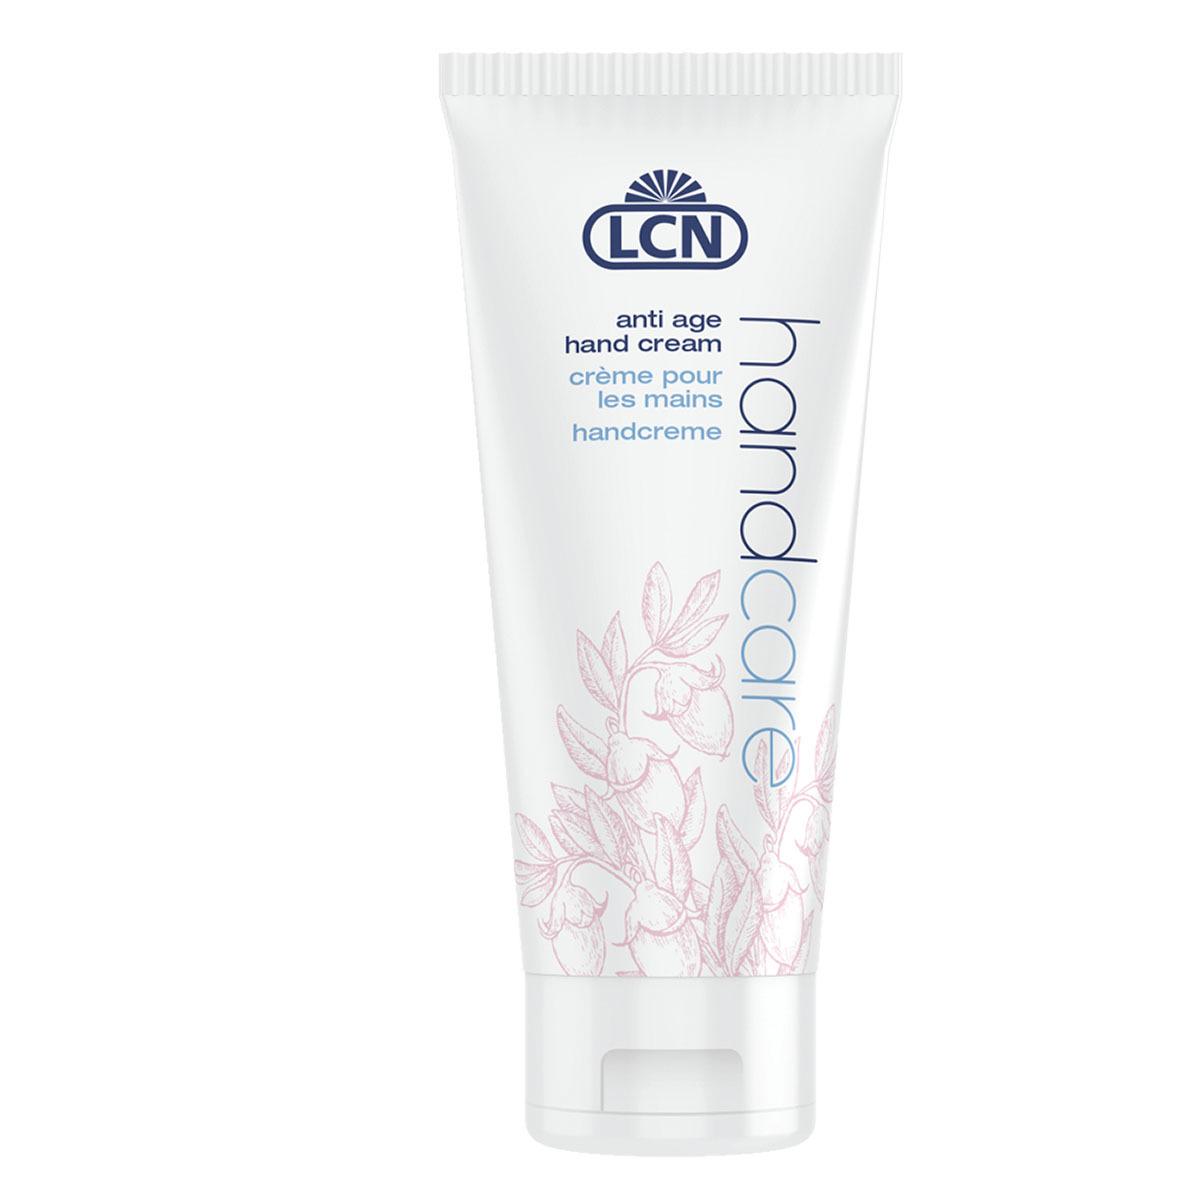 Anti Age Hand Cream 91109